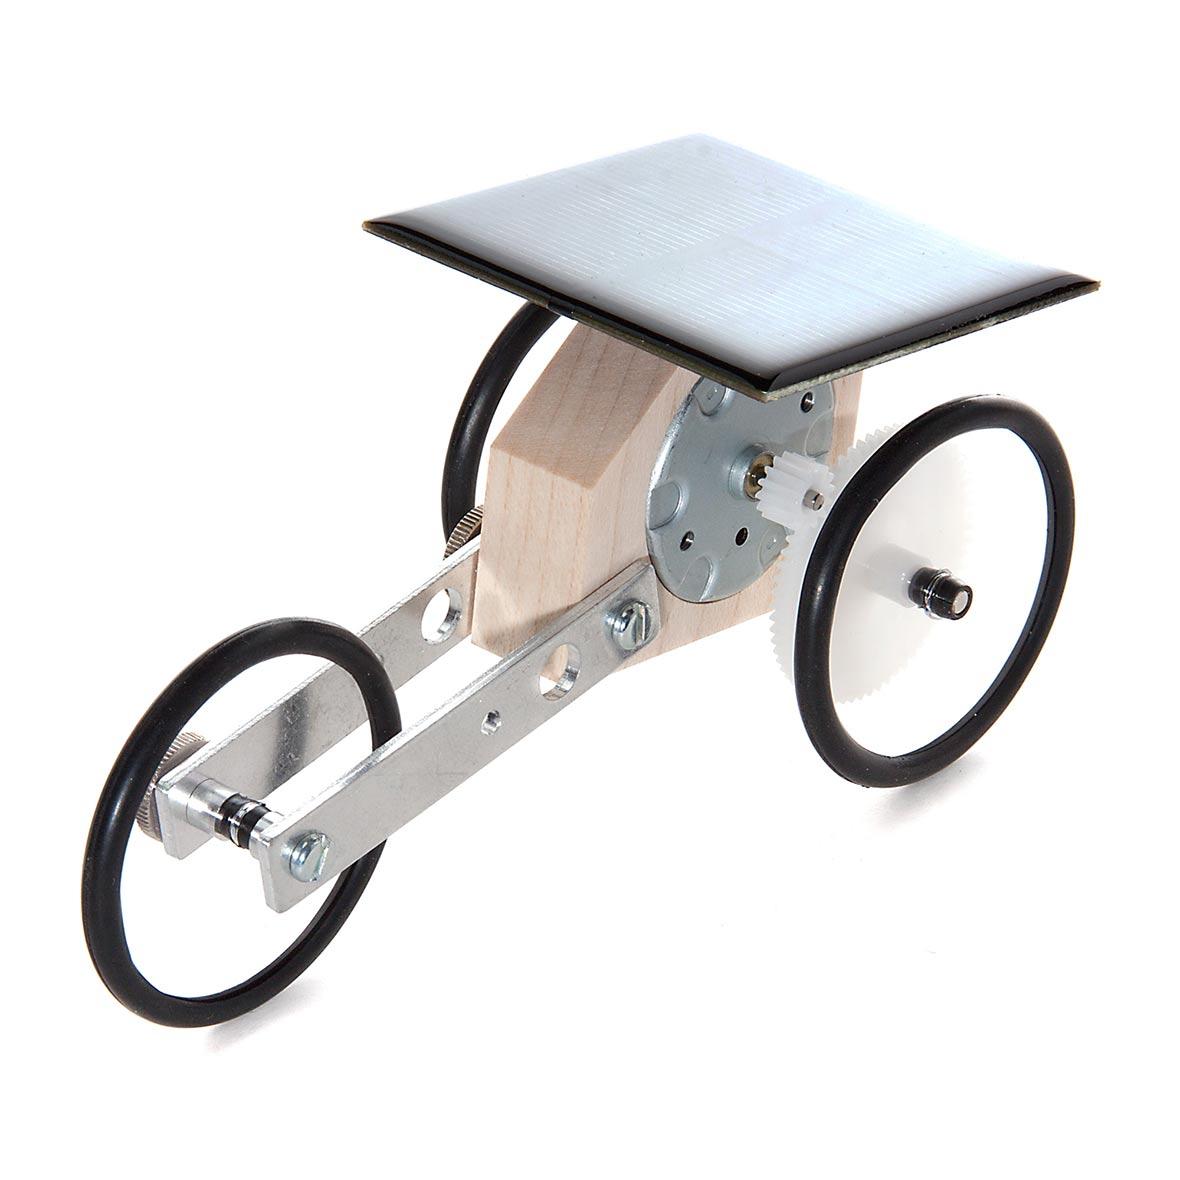 Solar-Holzauto Smobili von Solartoys, Frontansicht